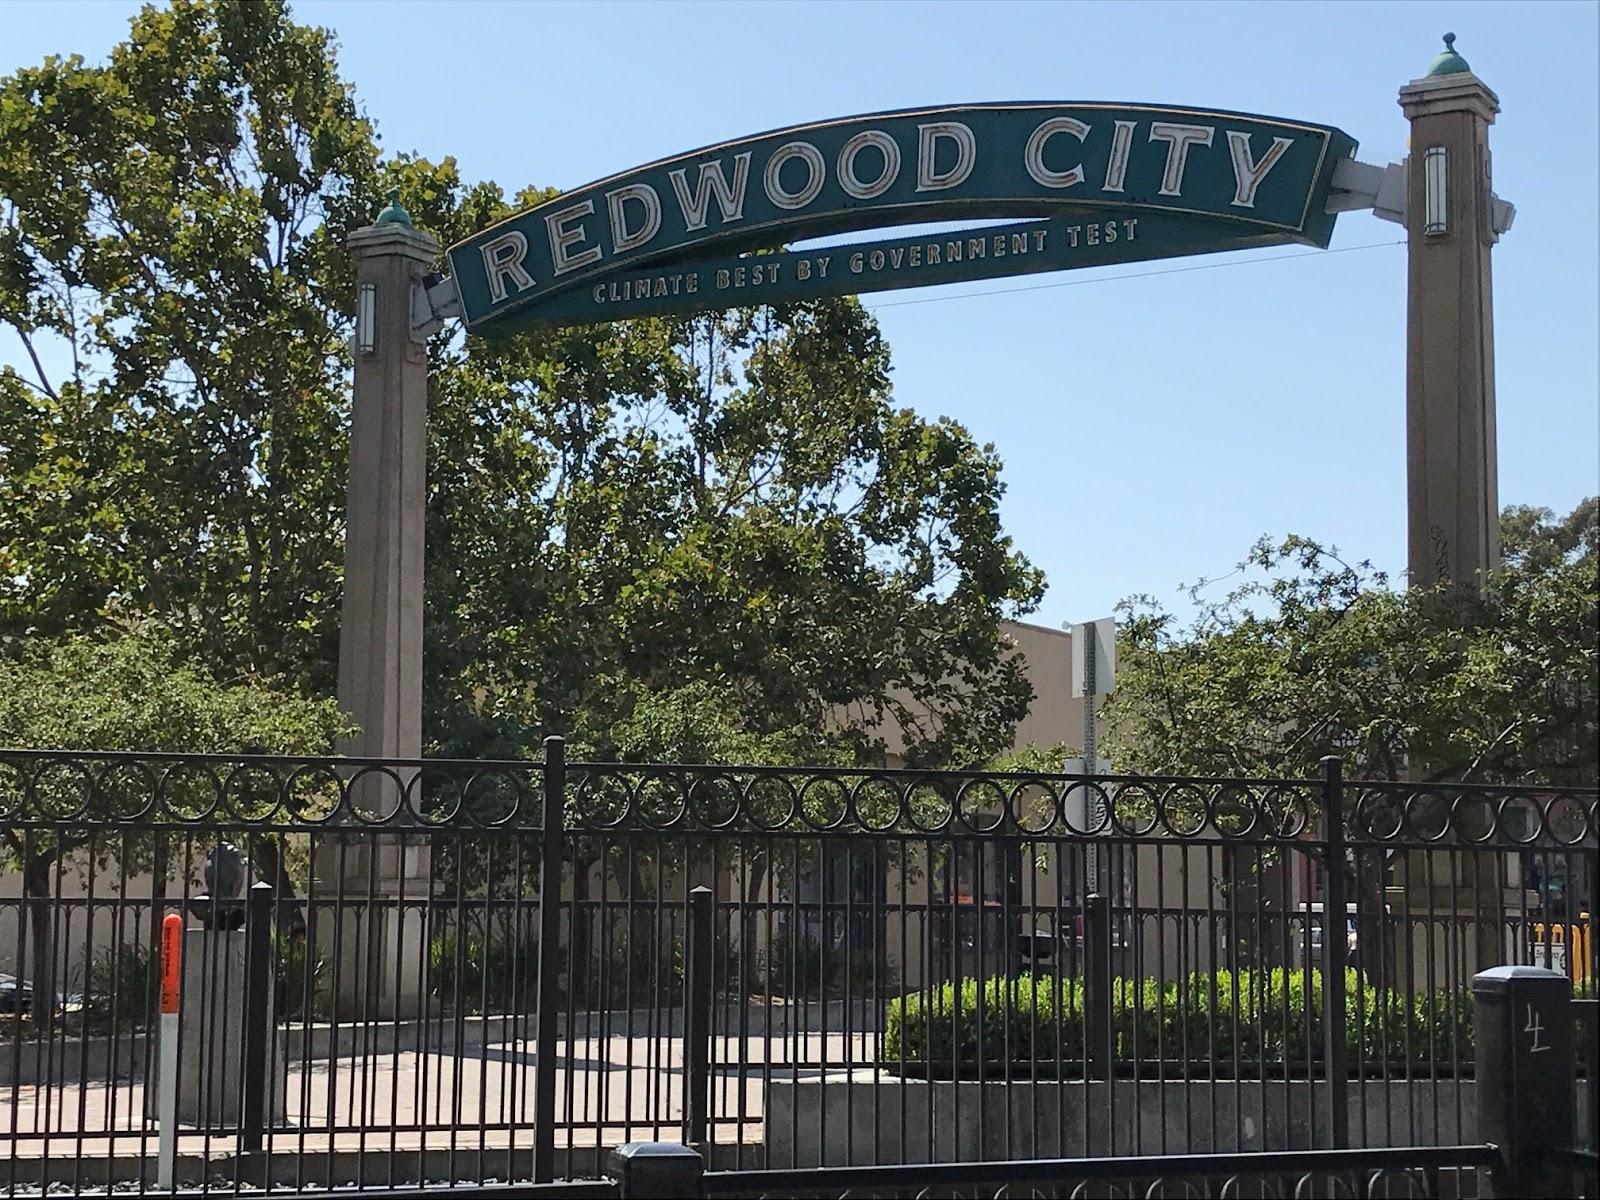 KK's Photo Friday: Redwood City, CA